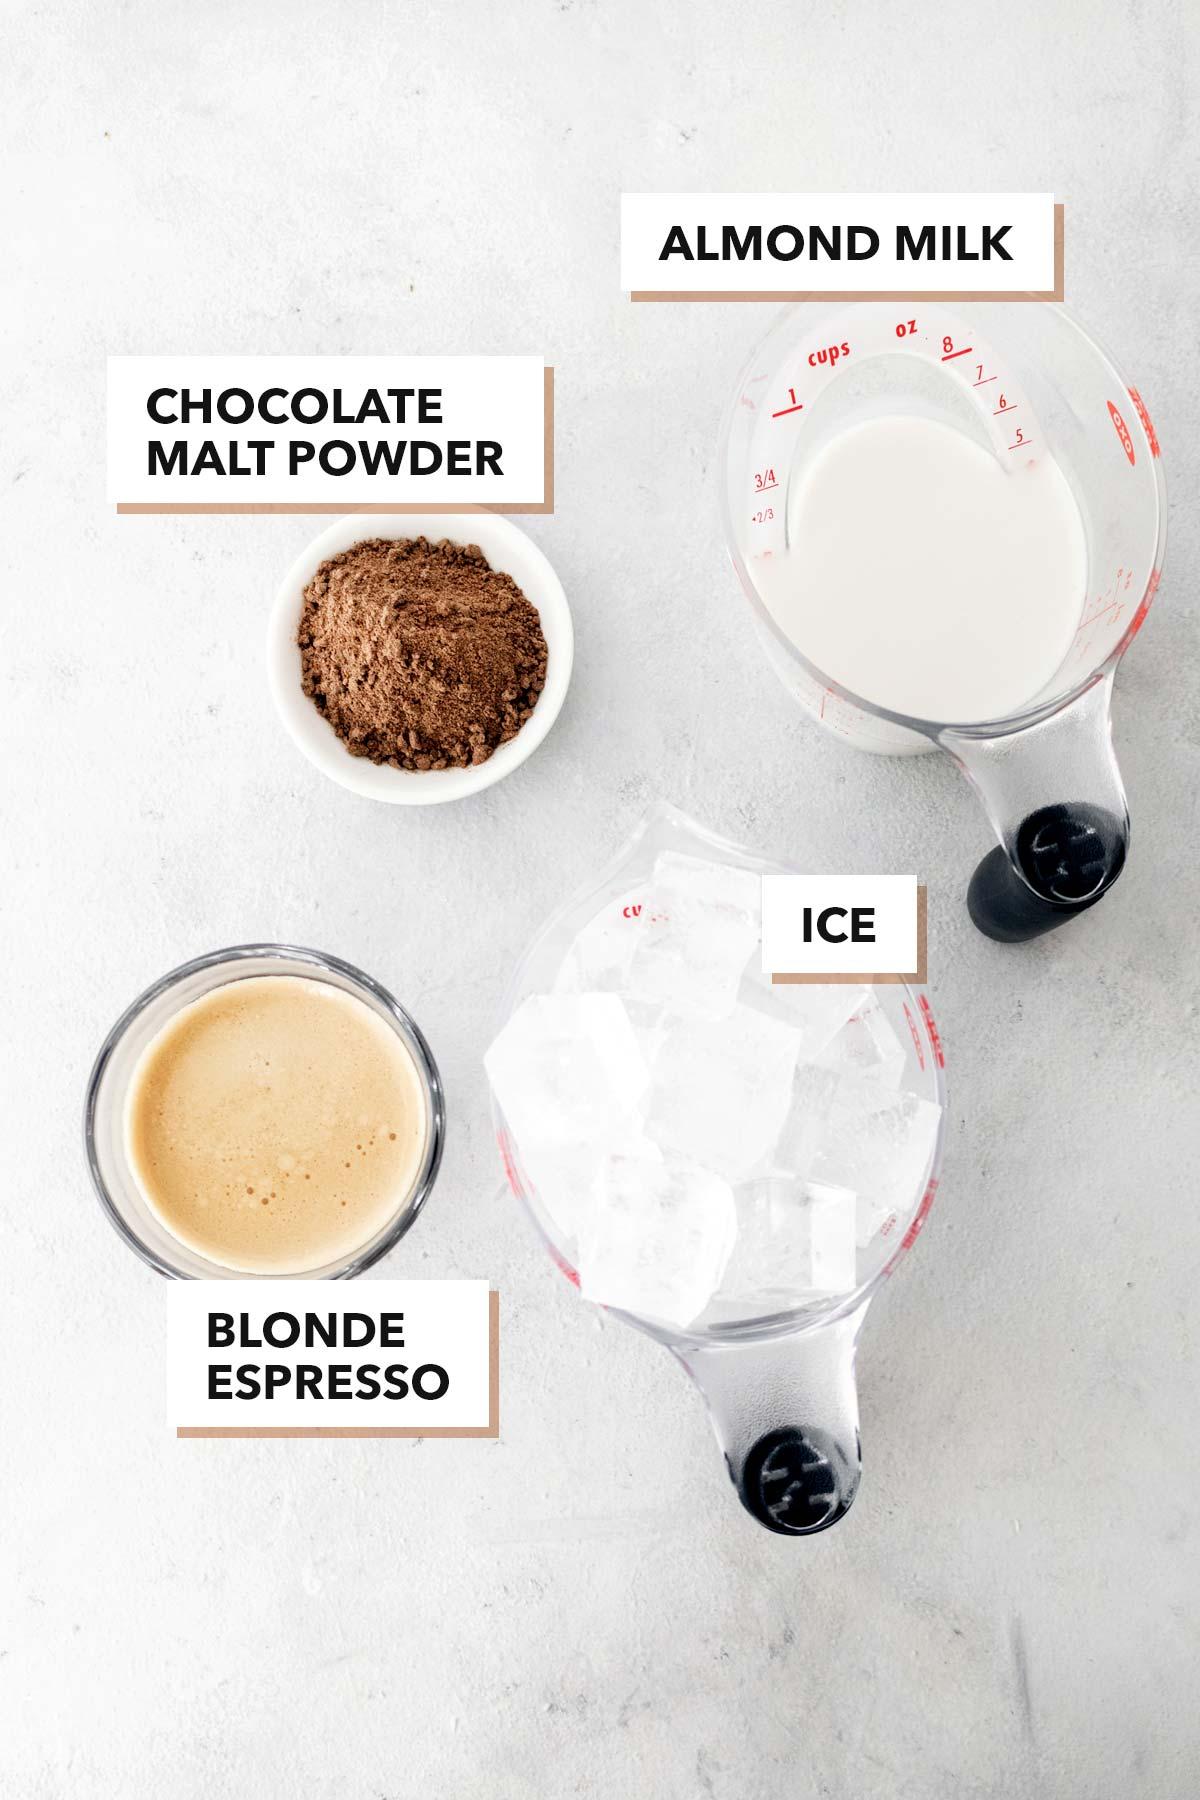 Starbucks Iced Chocolate Almondmilk Shaken Espresso Copycat ingredients.